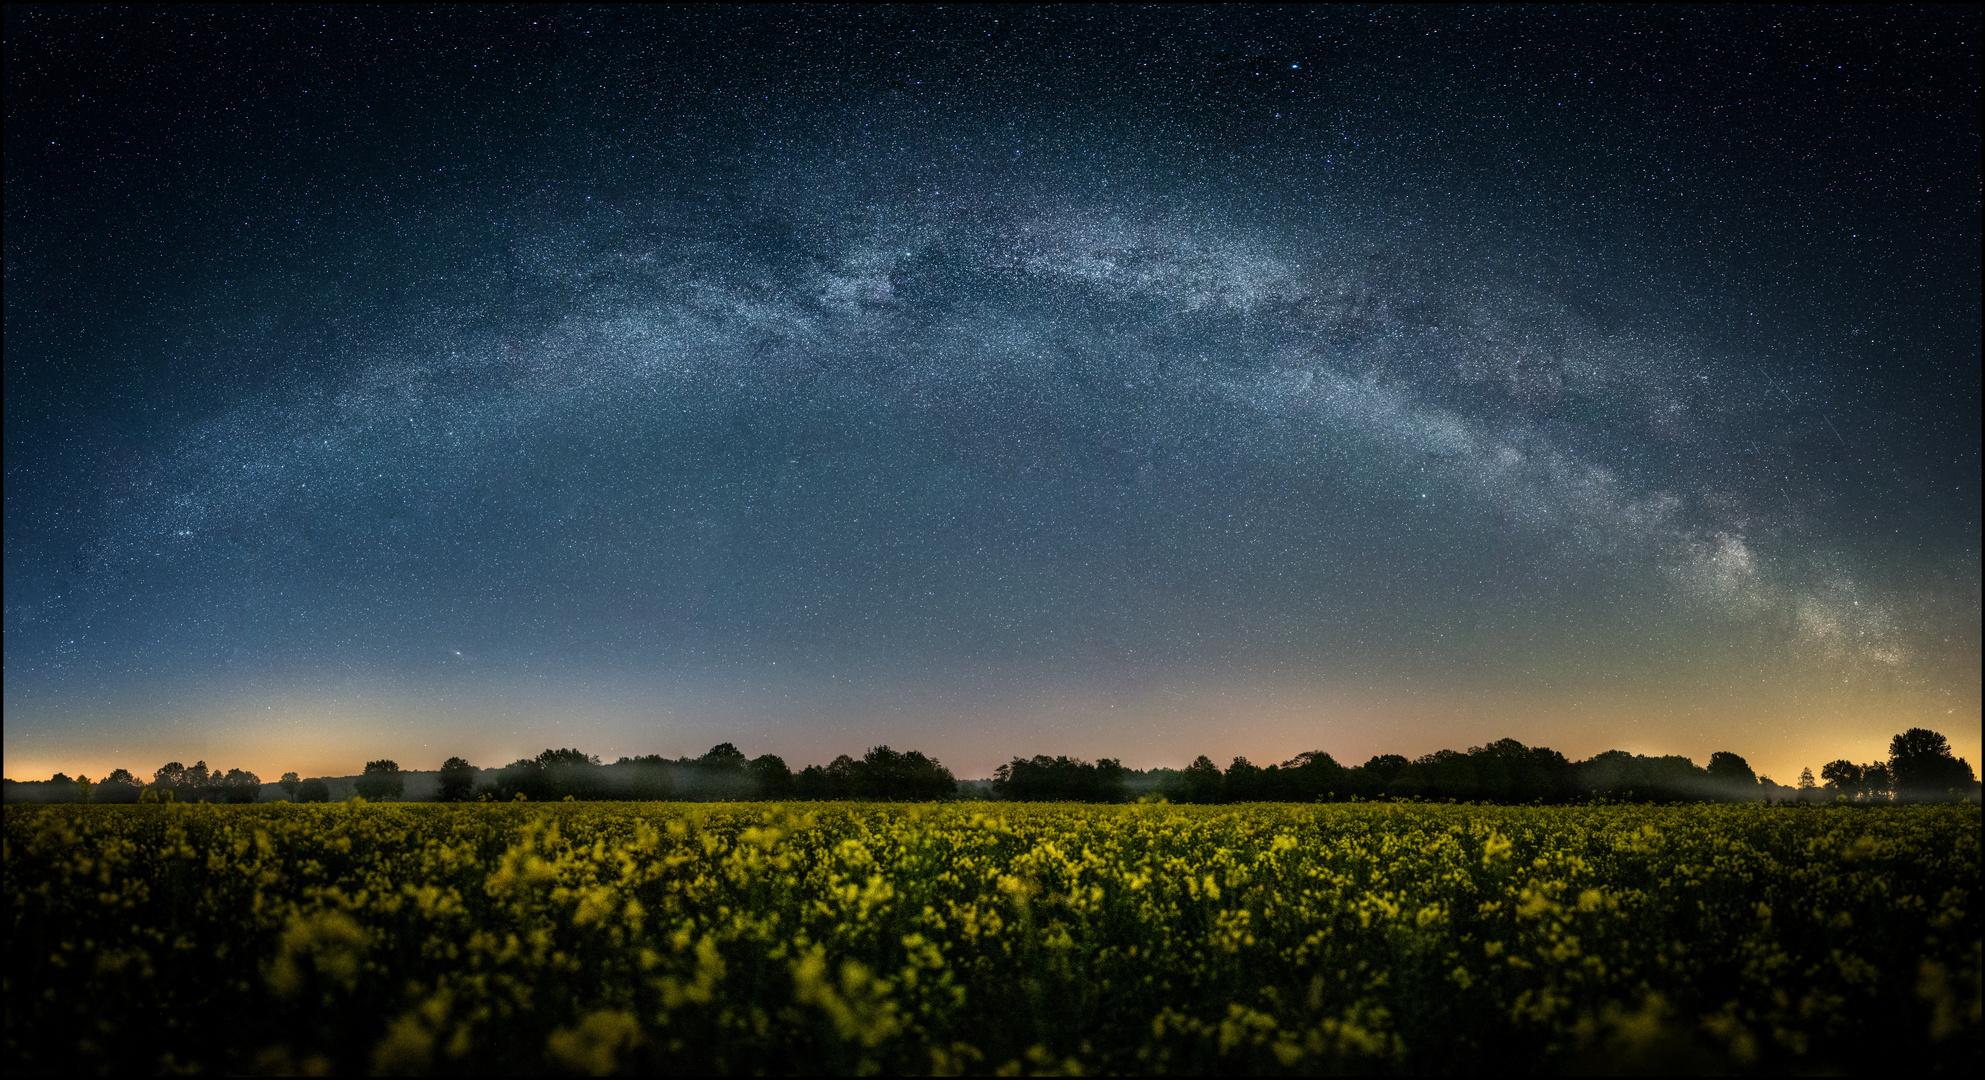 * Milky Way über Rapsblüte *